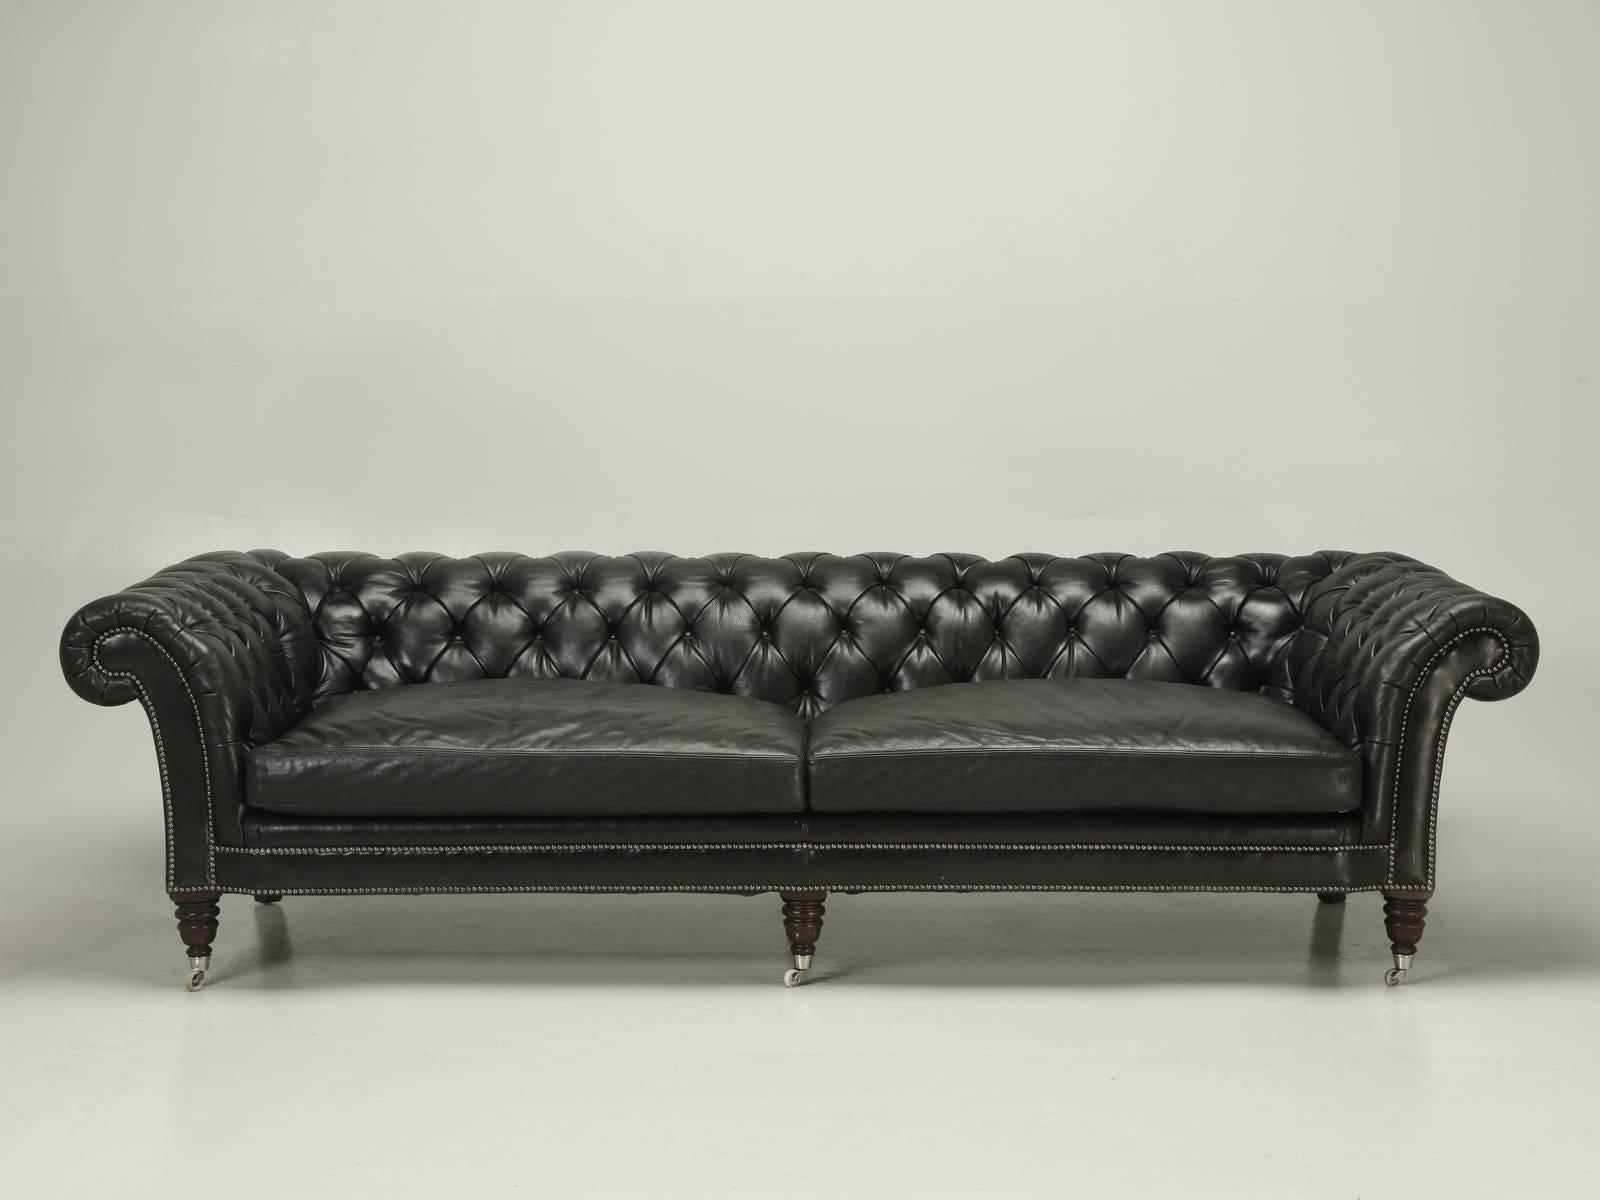 ralph lauren black leather chesterfield style sofa from paris at rh 1stdibs com Black Chesterfield Sofa Martha Stewart Chesterfield Sofa